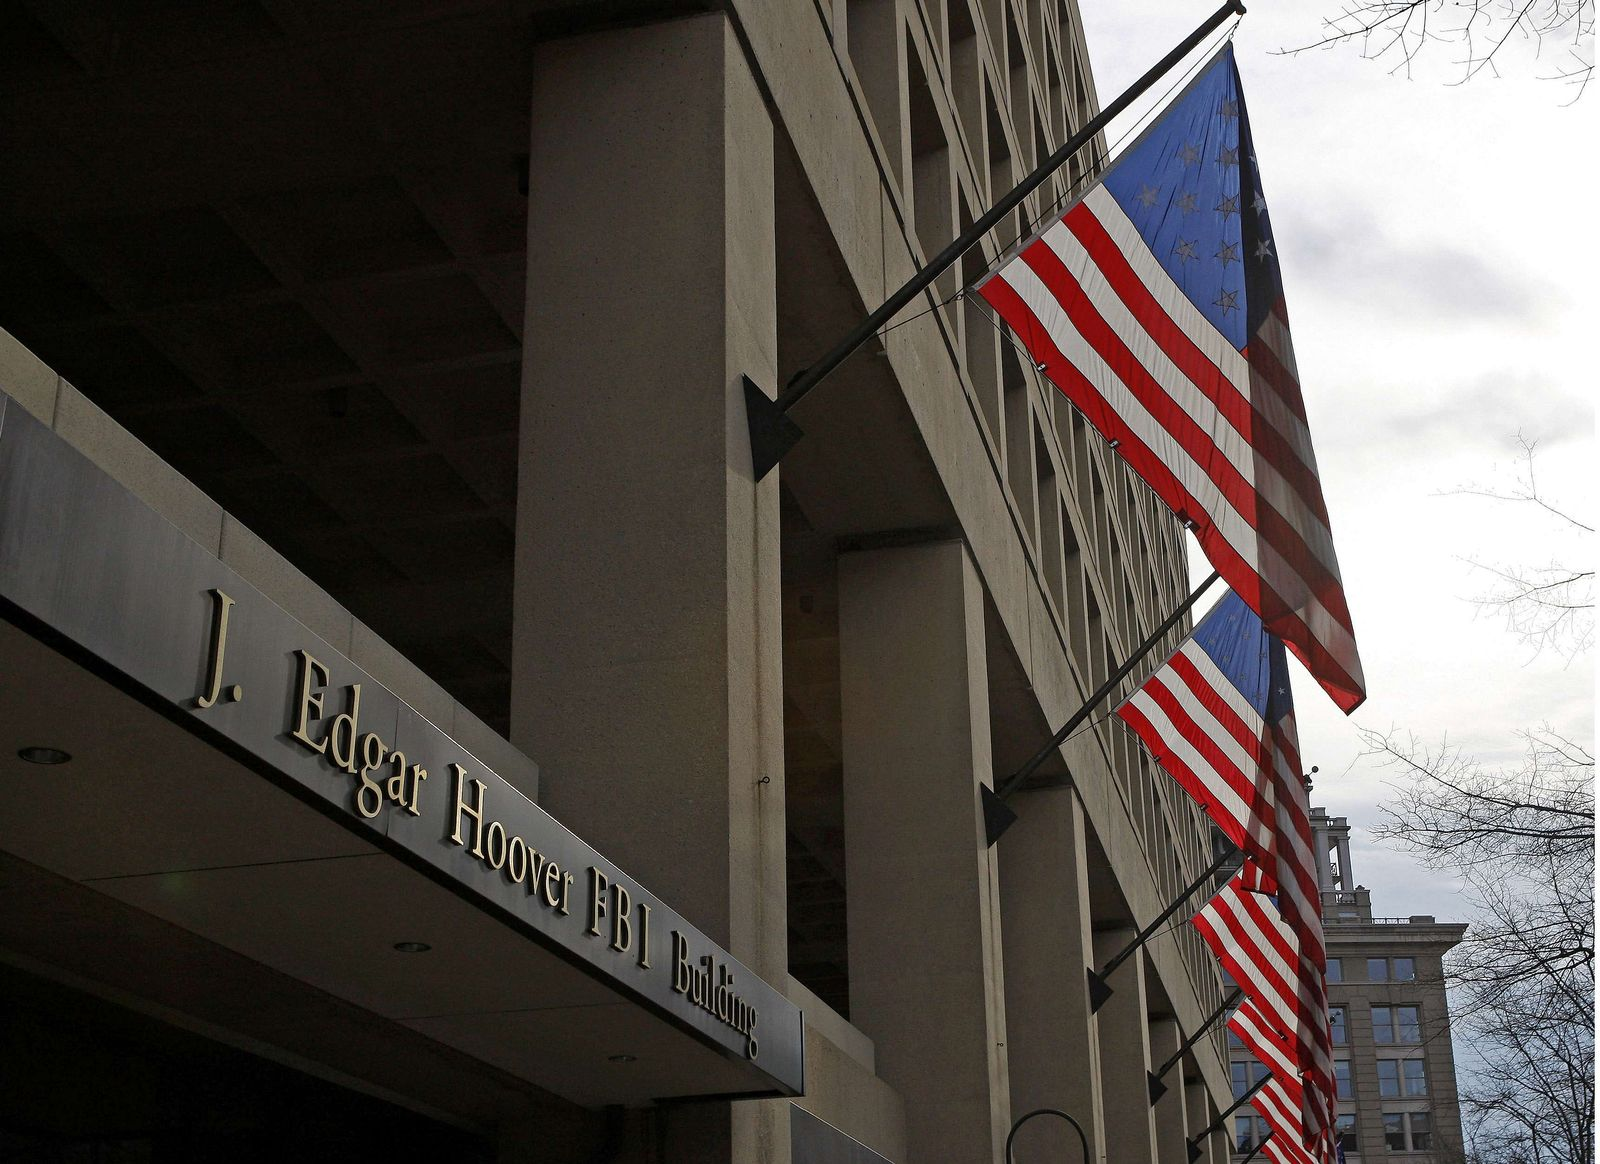 USA-FBI/BUILDING